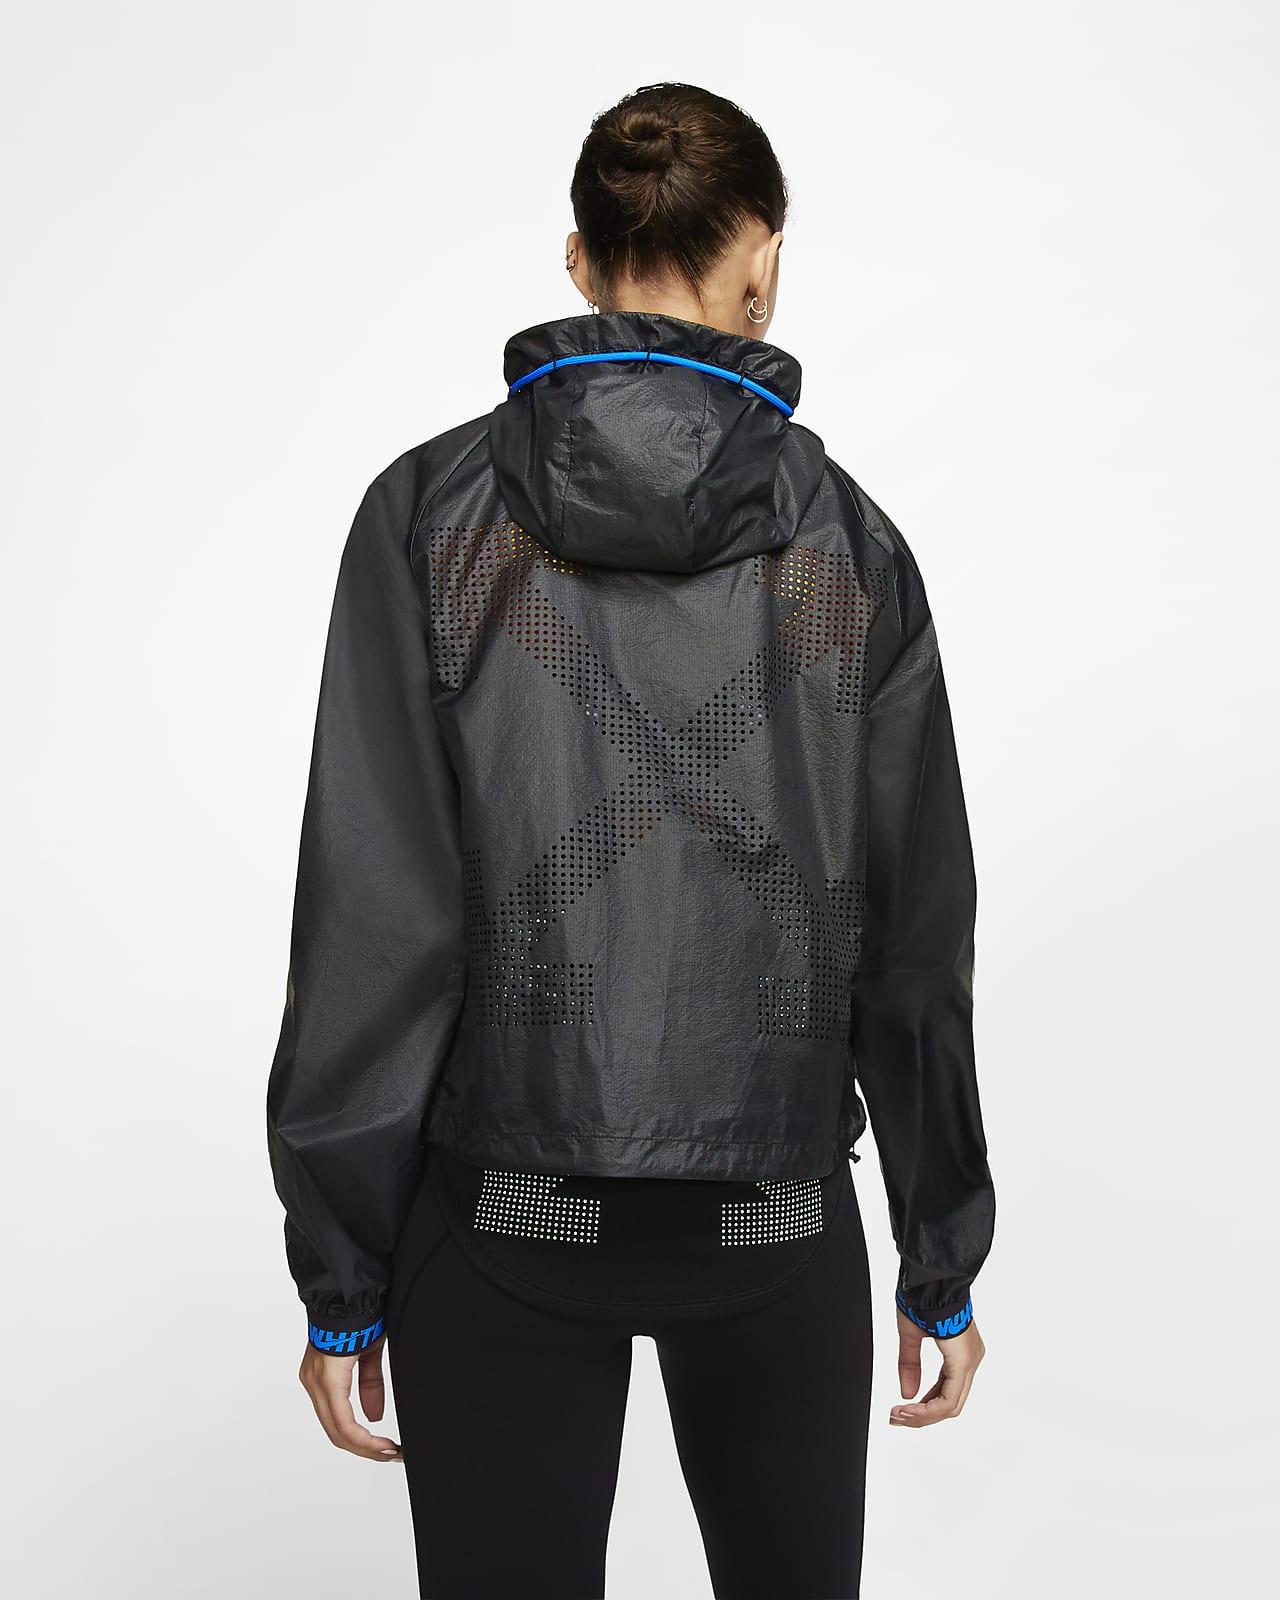 Nike x Off-White™ Women's Jacket. Nike PH